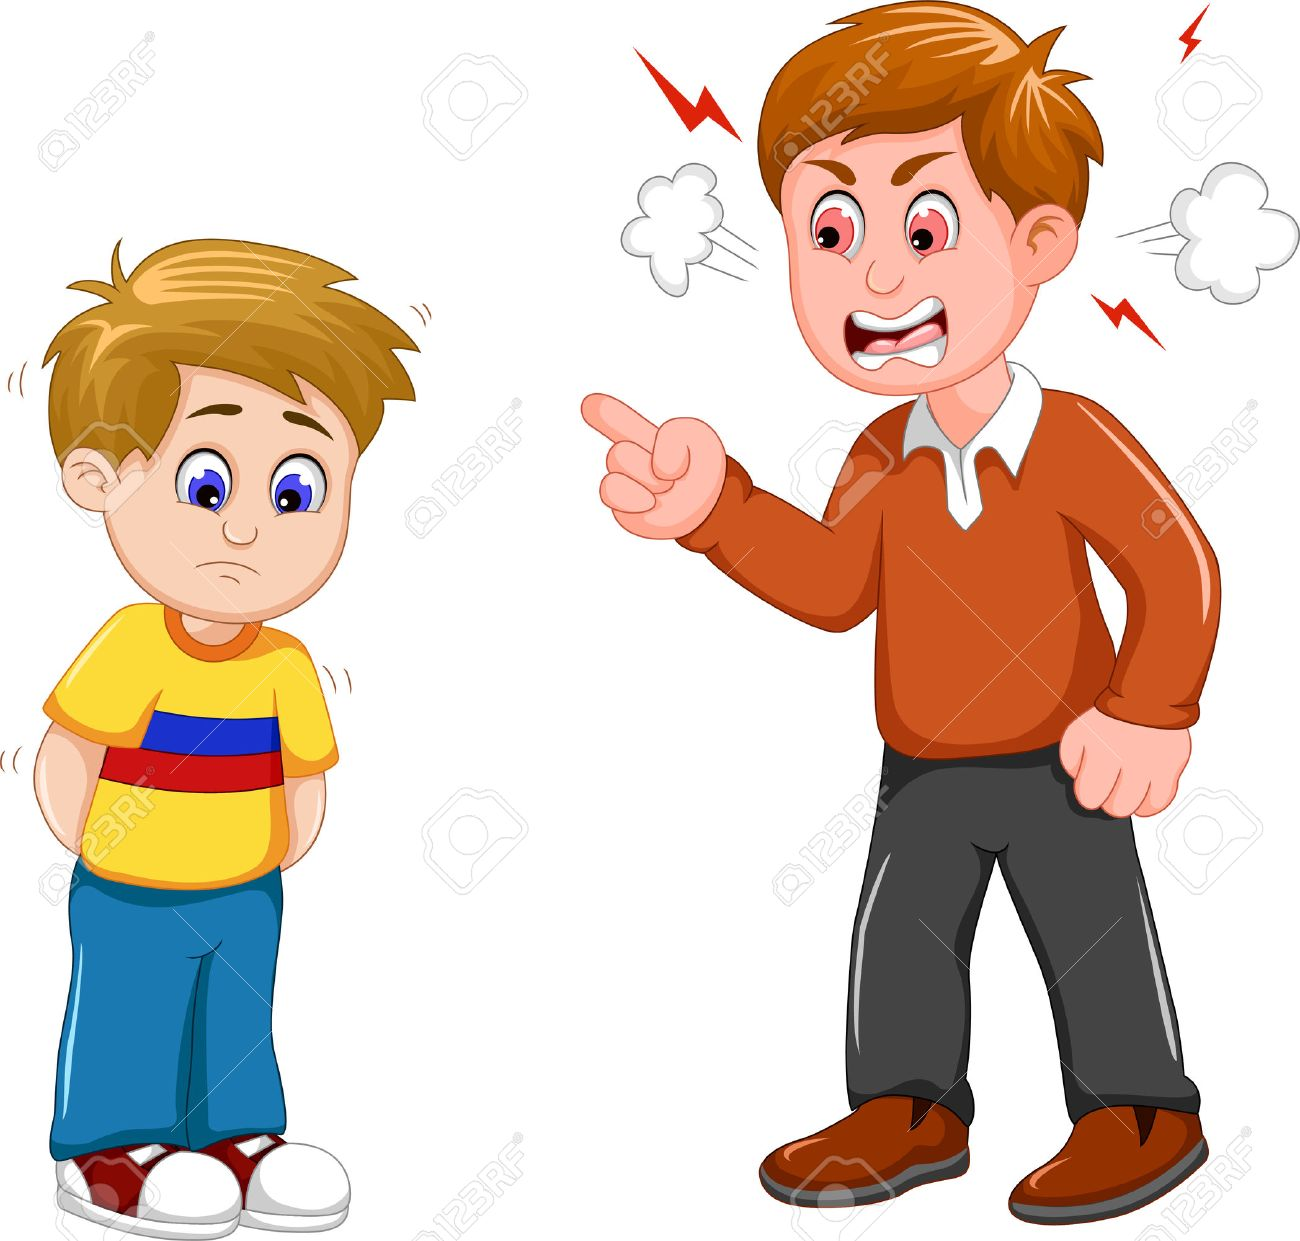 cartoon father scolding his son - 67754546